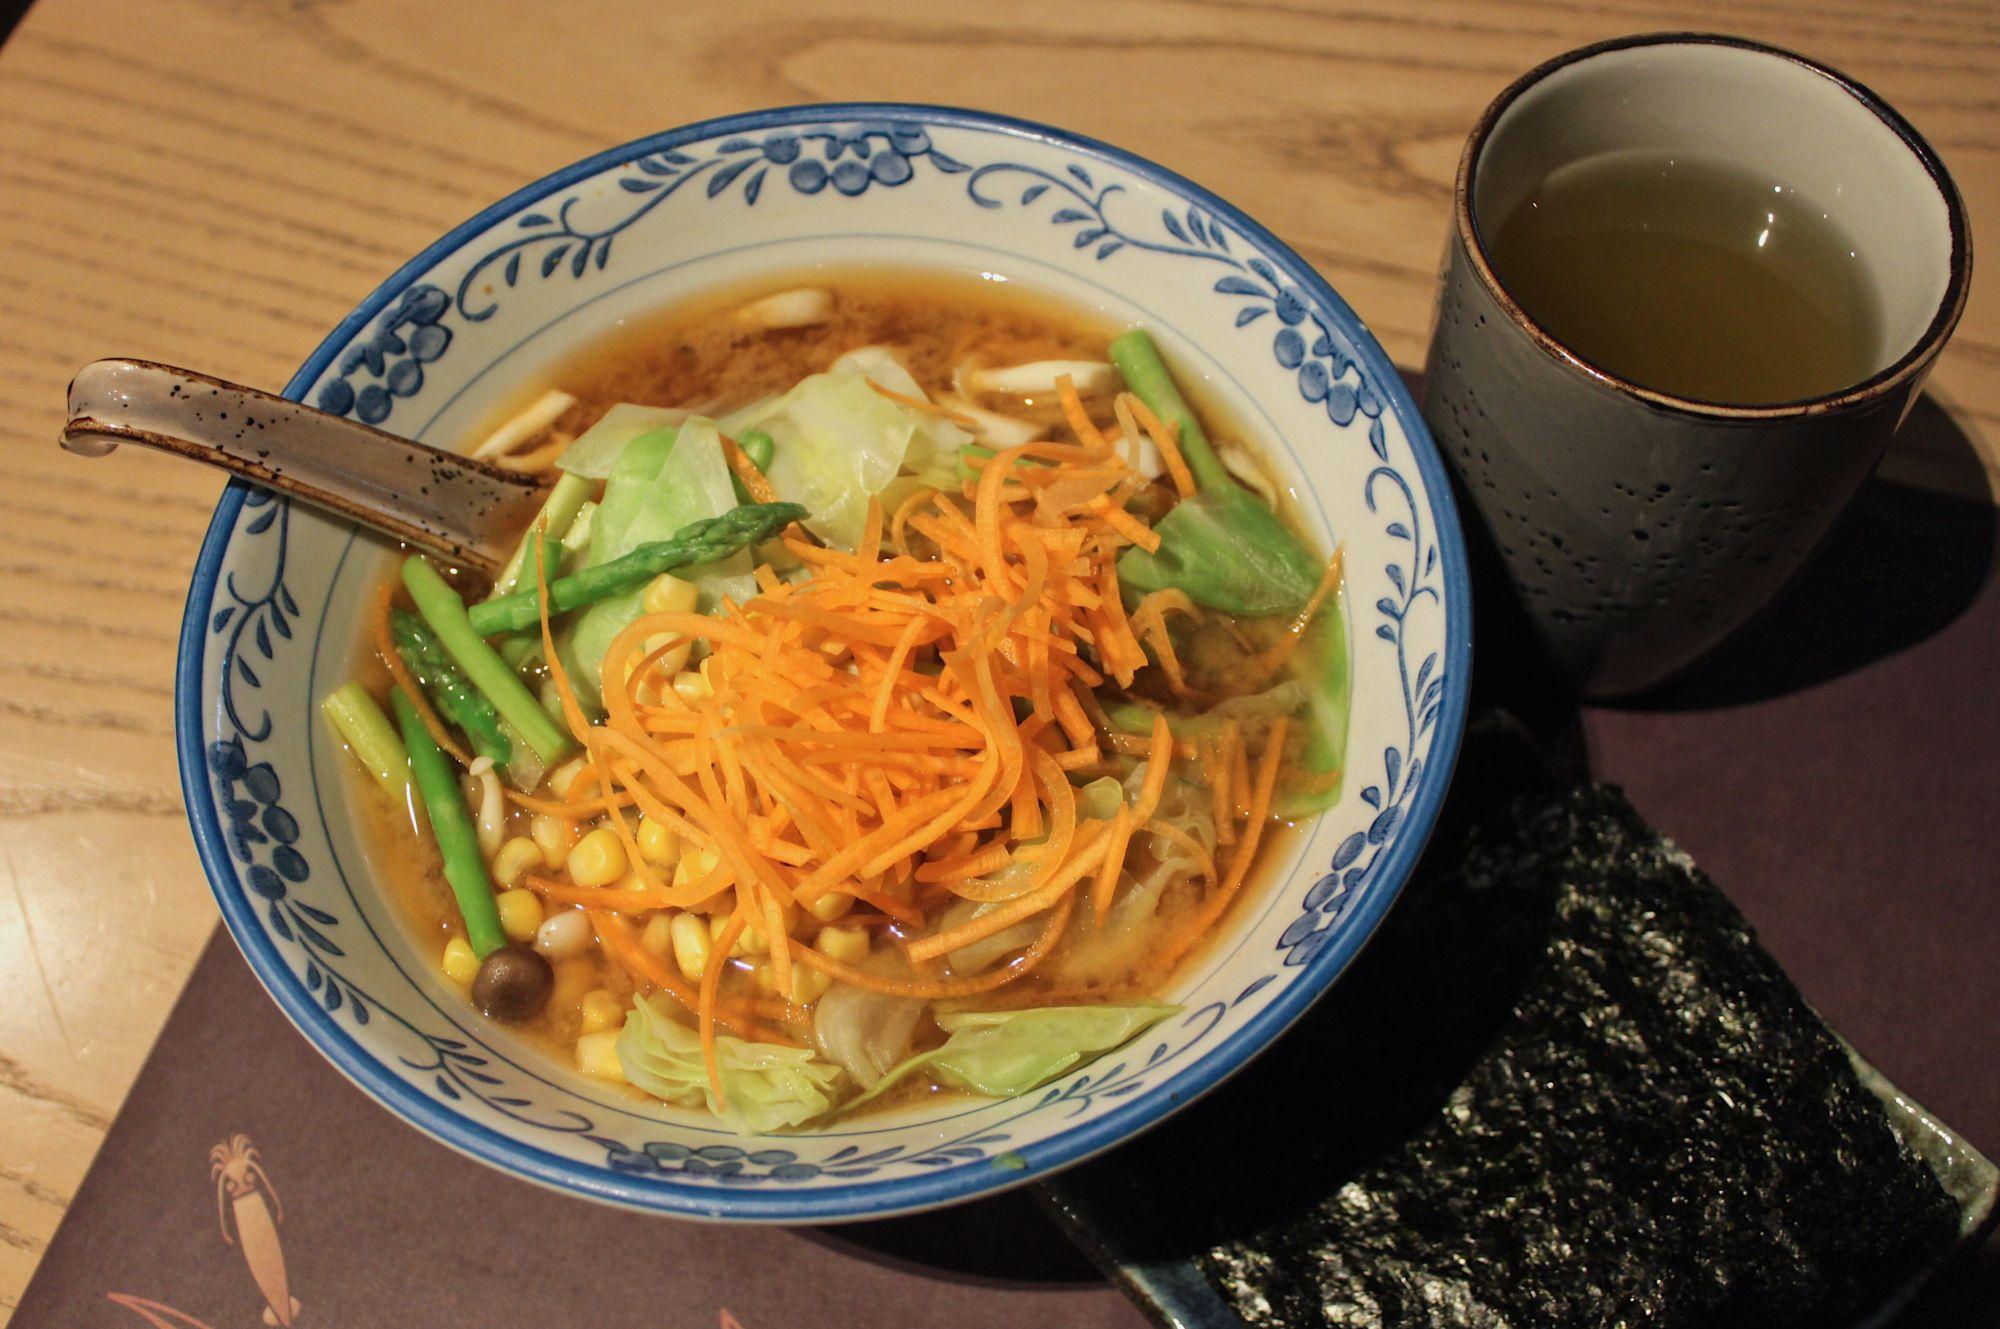 mian_vegetarian ramen_studio city_best ramen spots Taipa Macau